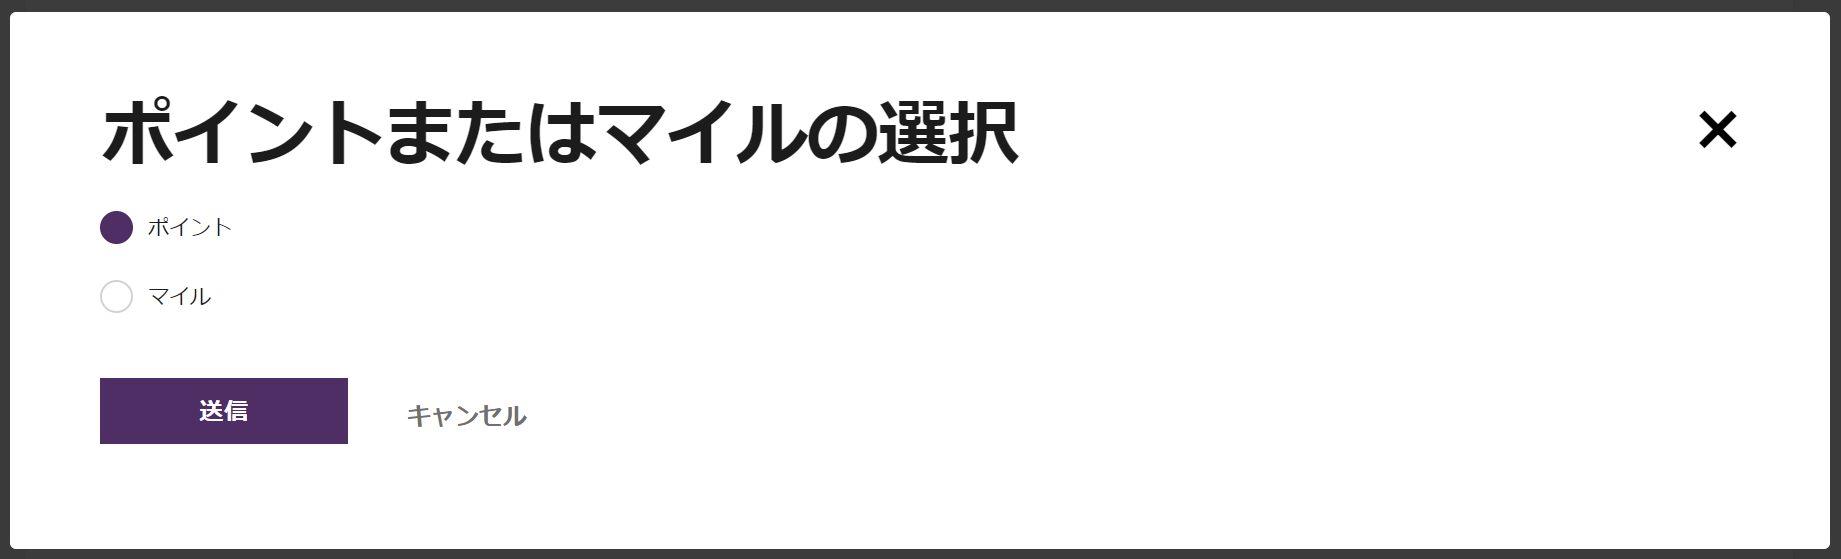 SPG・マリオットリワード会員登録方法10